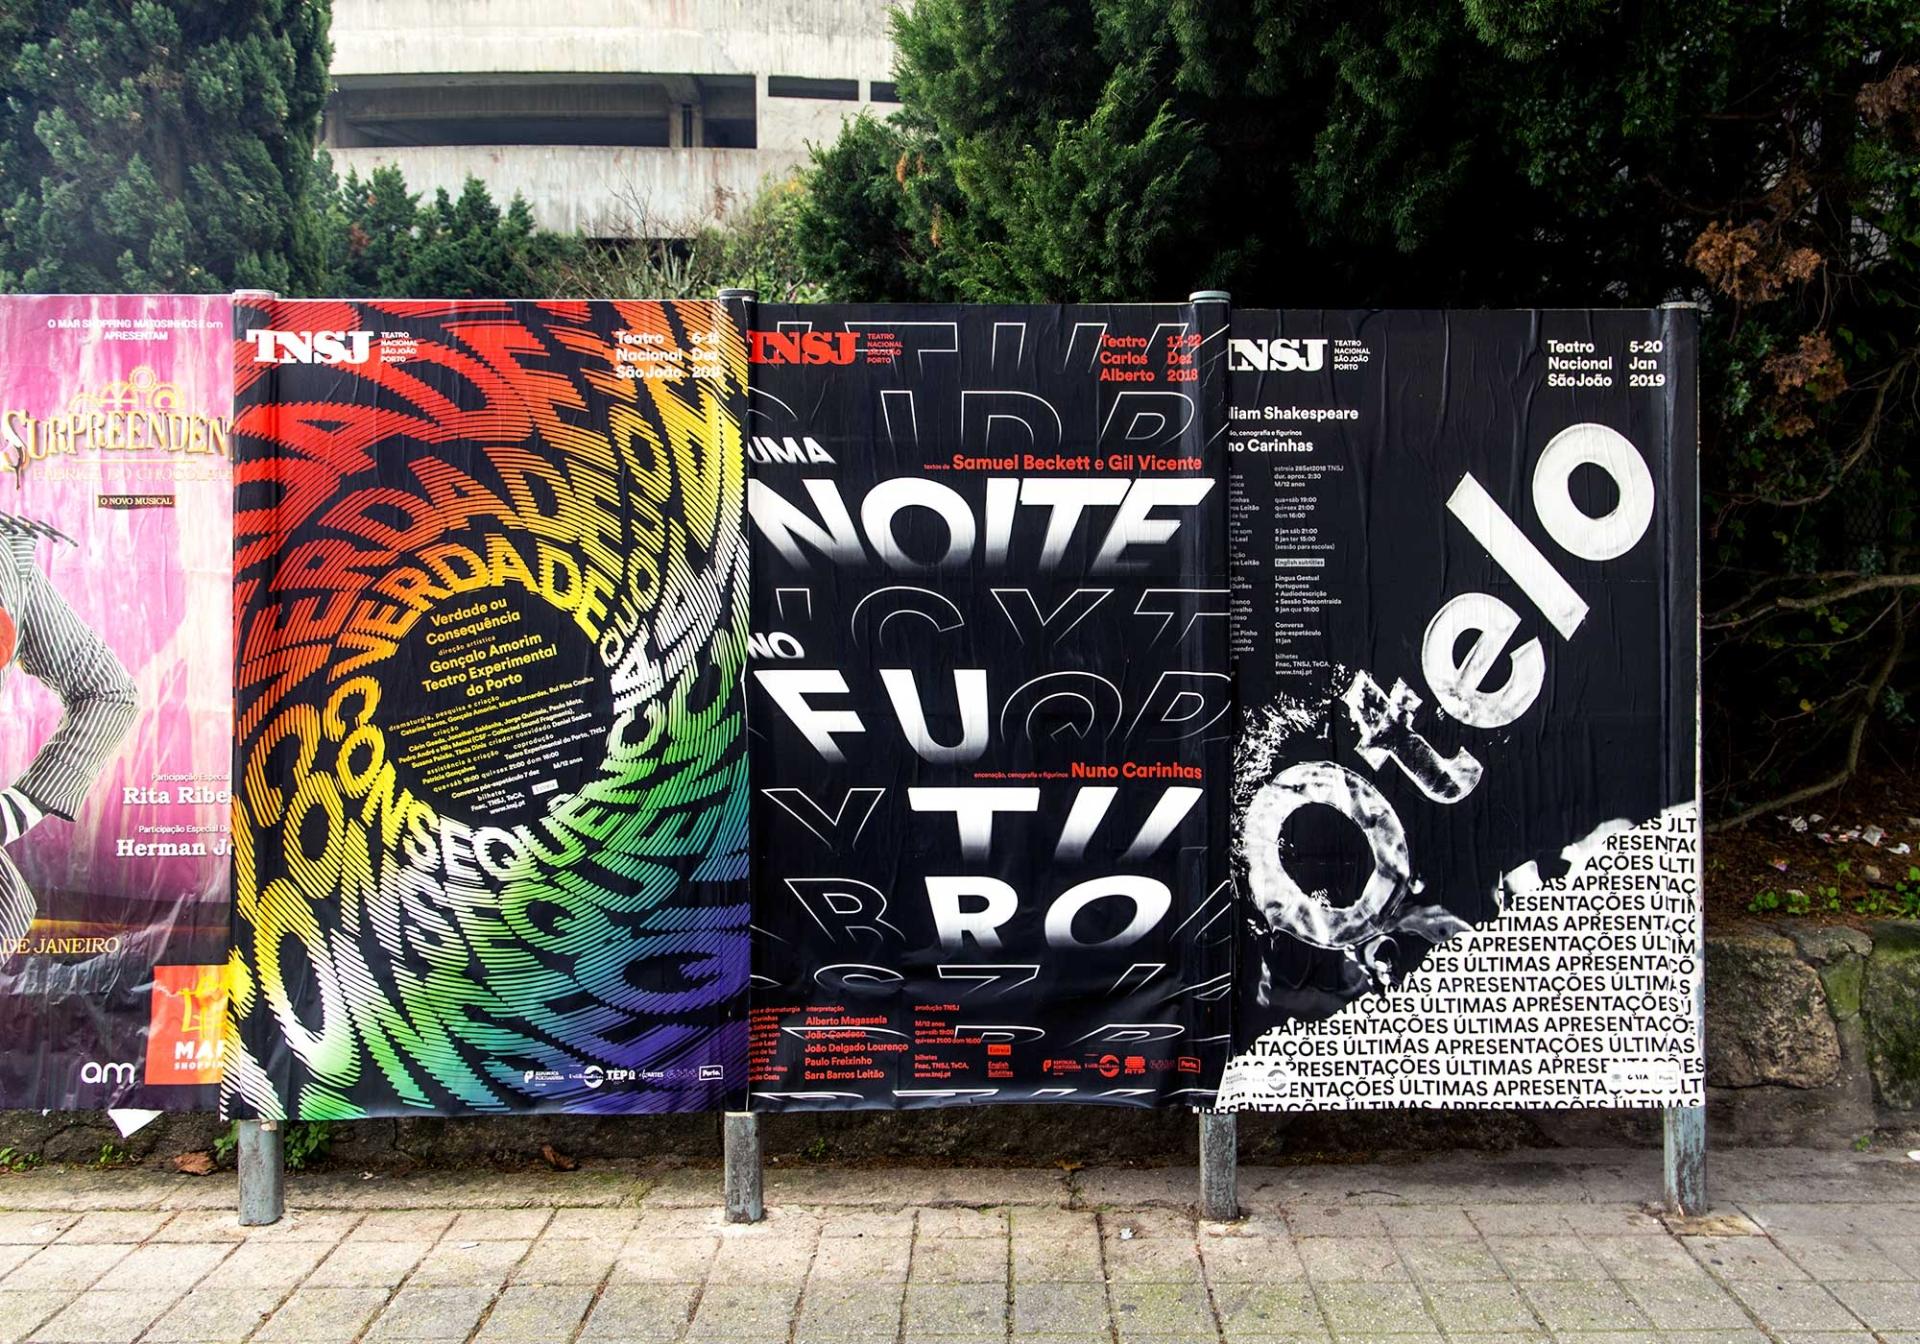 São João National Theatre Posters 2017-2018 Image:1 dobra-tnsj-VCoincidencia-02